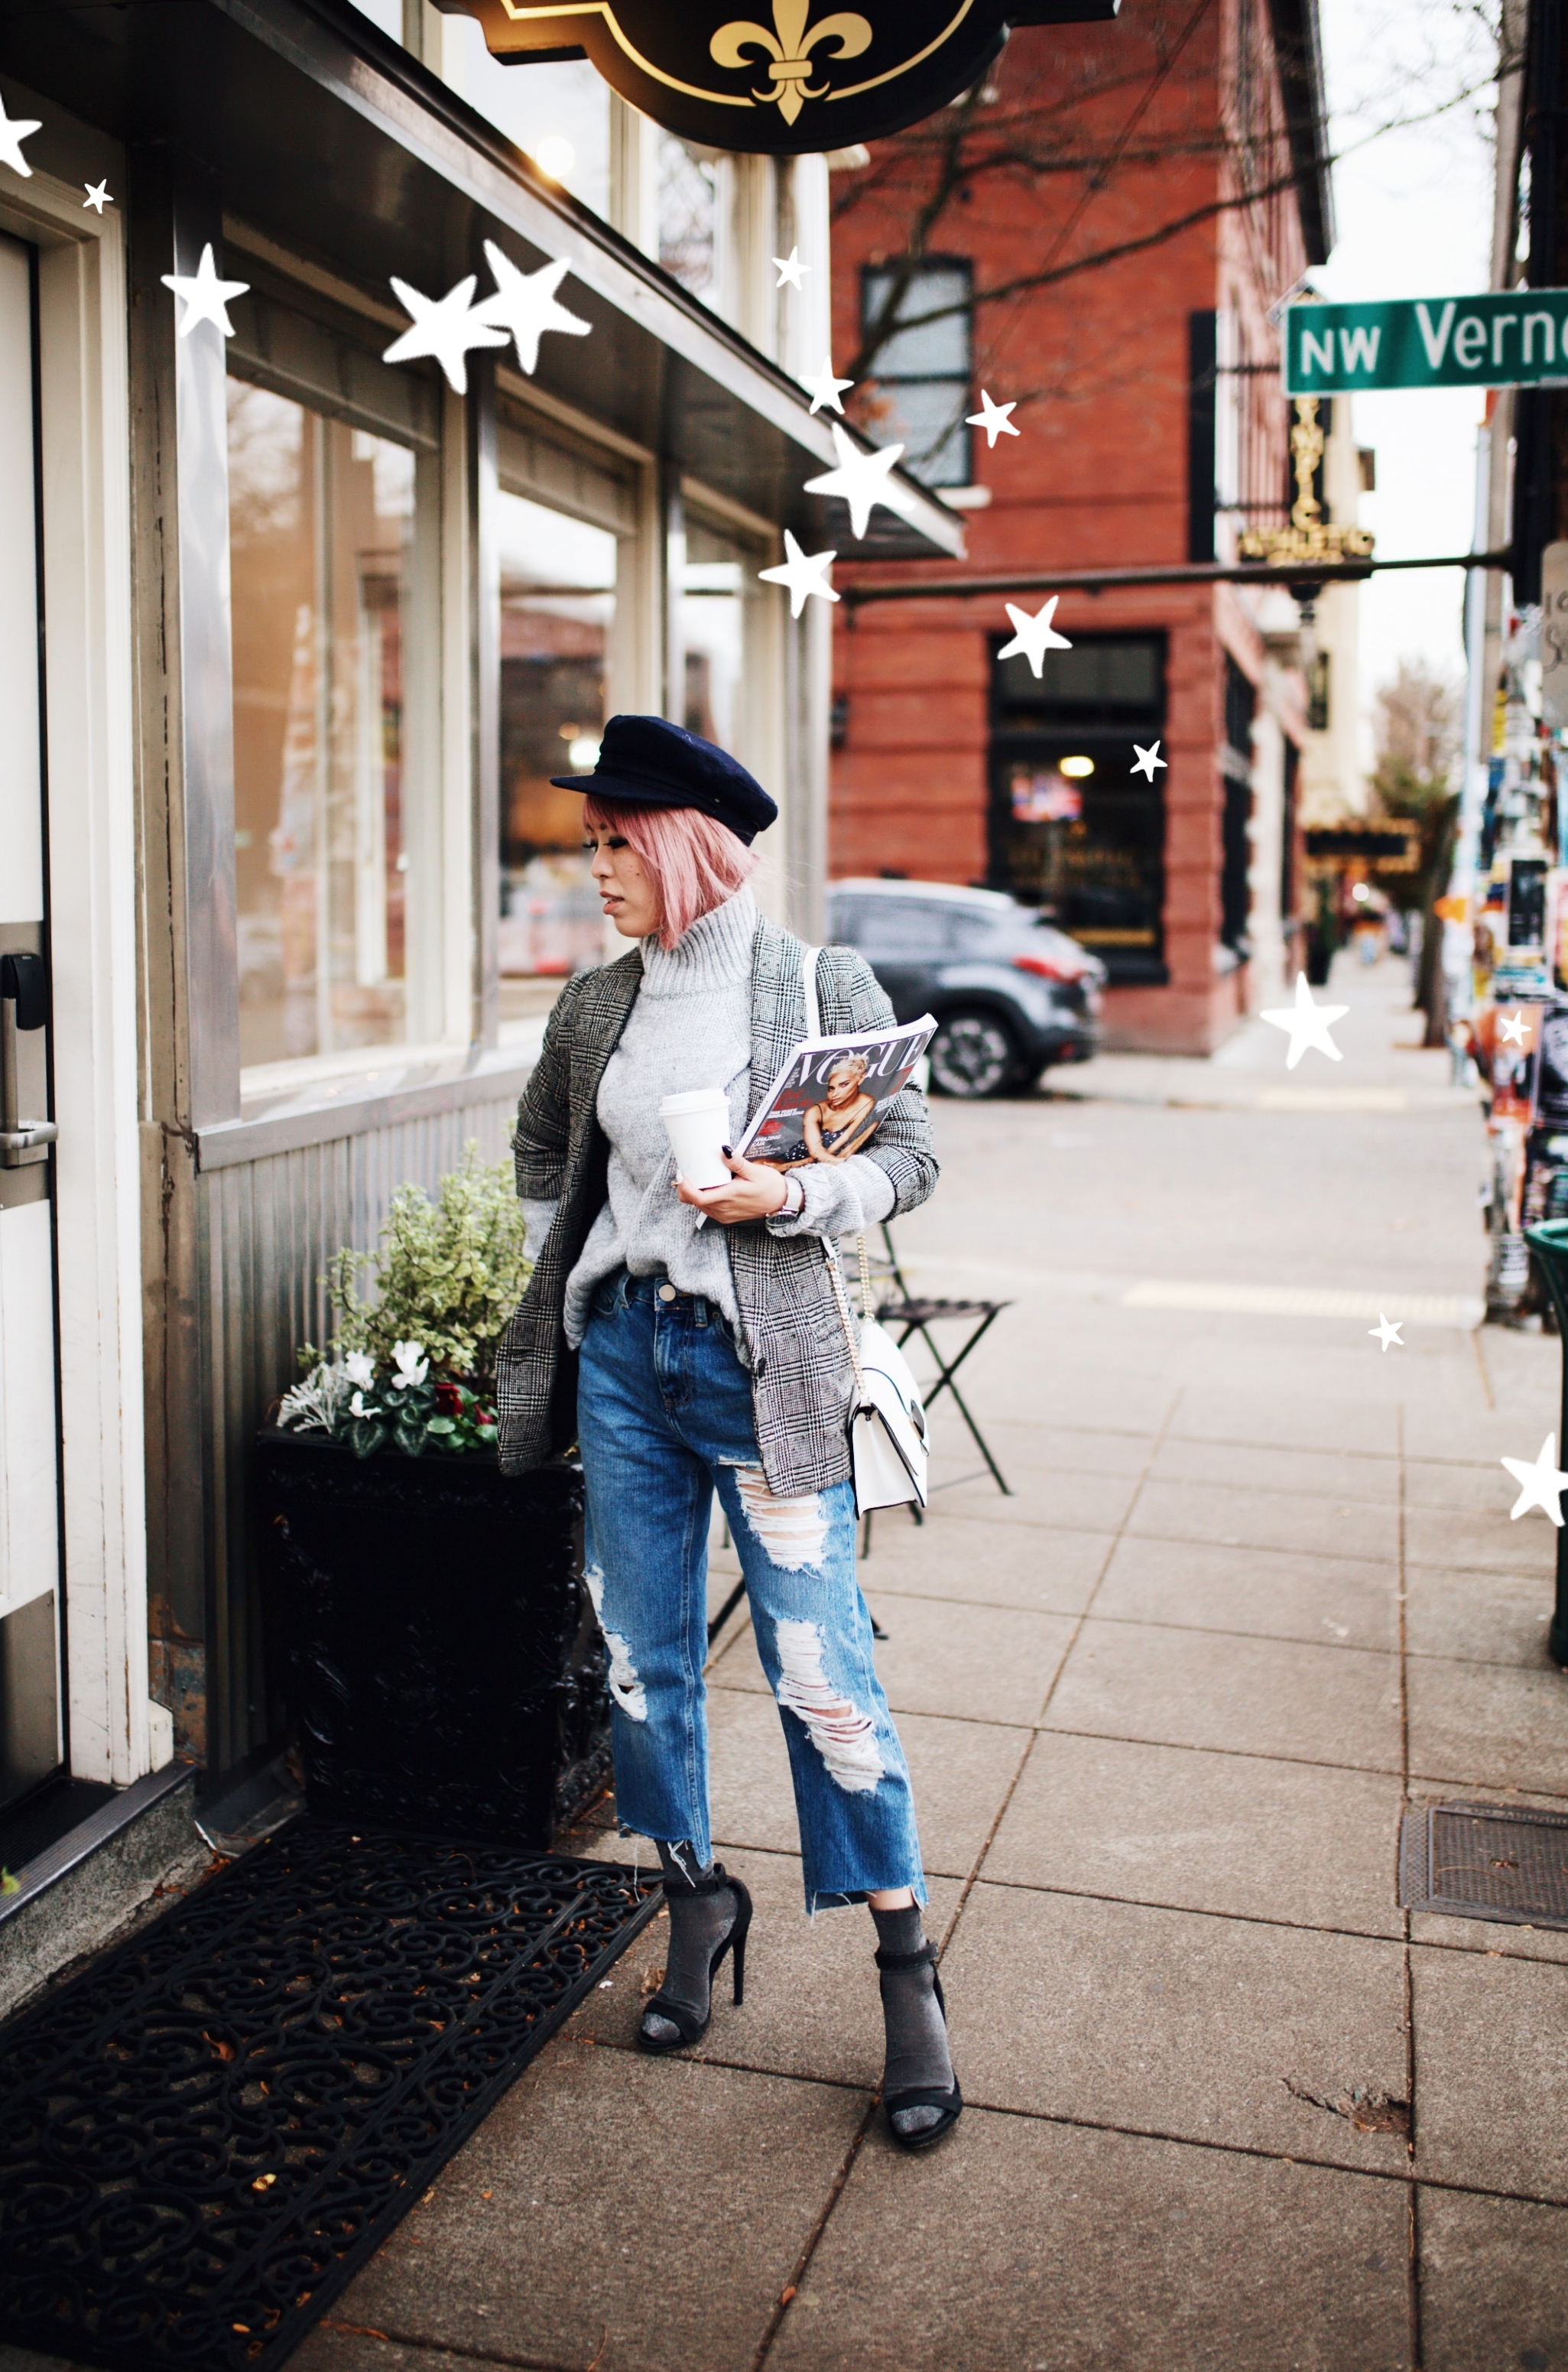 Kapten and Son watch-Zara Gray Turtleneck Sweater-Nordstrom Checked Blazer-ASOS Distressed frayed hem jeans-NAIGAI Glitter Ankle Socks-Black scrappy sandals-H&M White Crossbody Bag-Aritzia Fisherman Hat-Aika's Love Closet-Seattle fashion style blogger-pink hair-Japanese 10